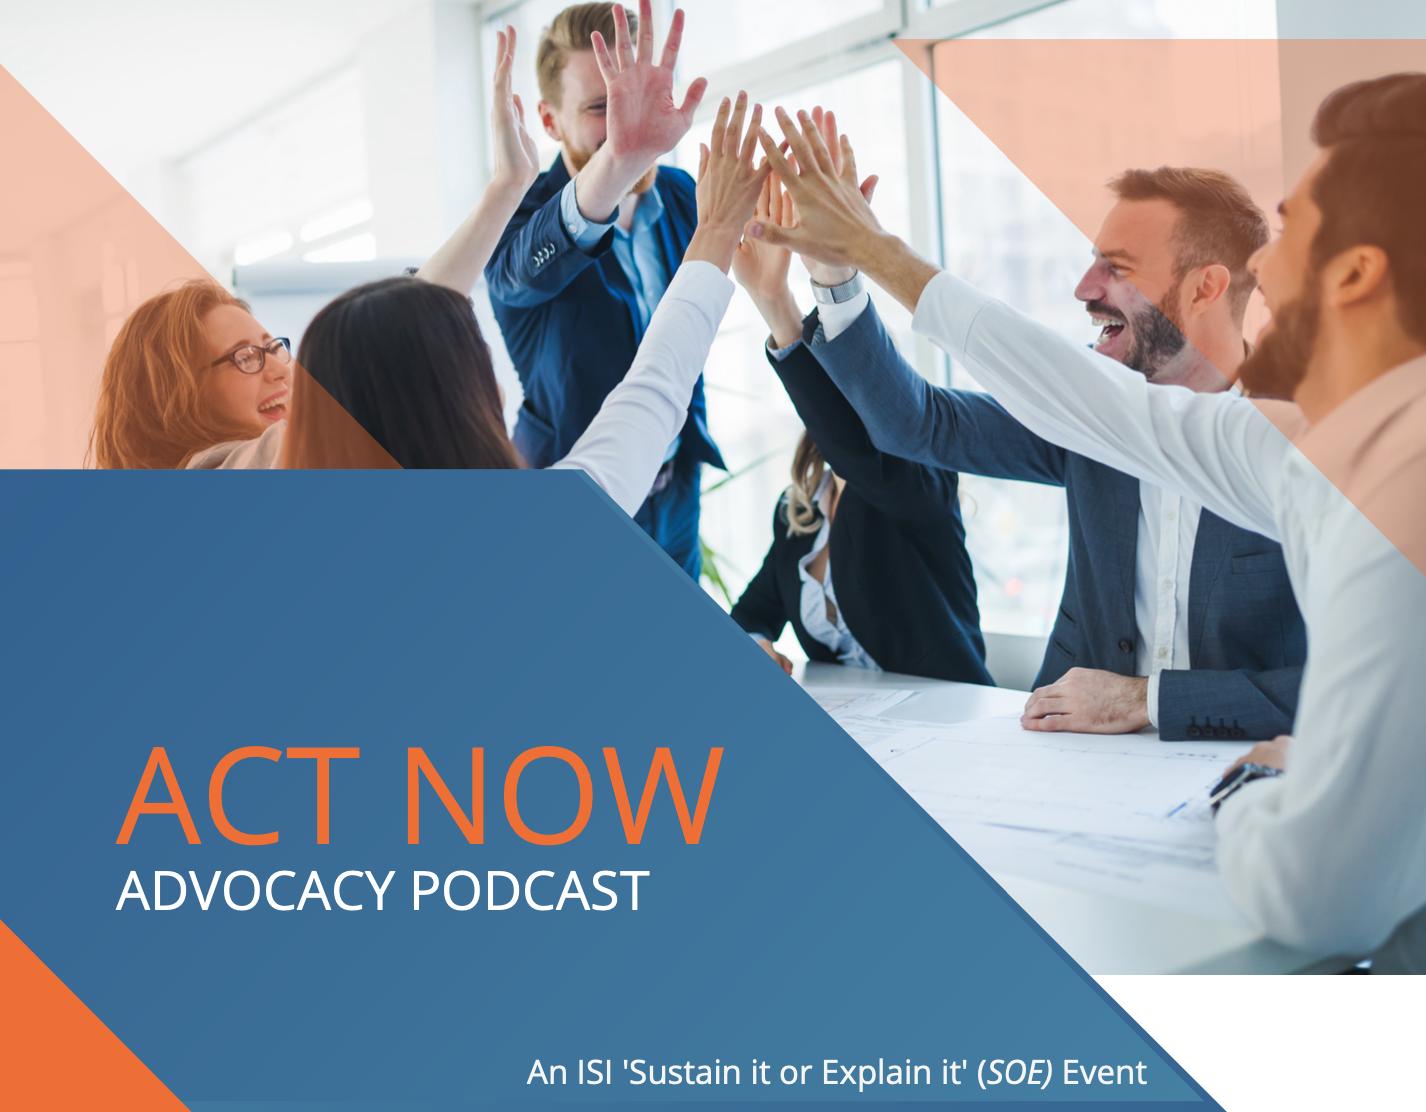 ACT NOW Advocacy Podcast